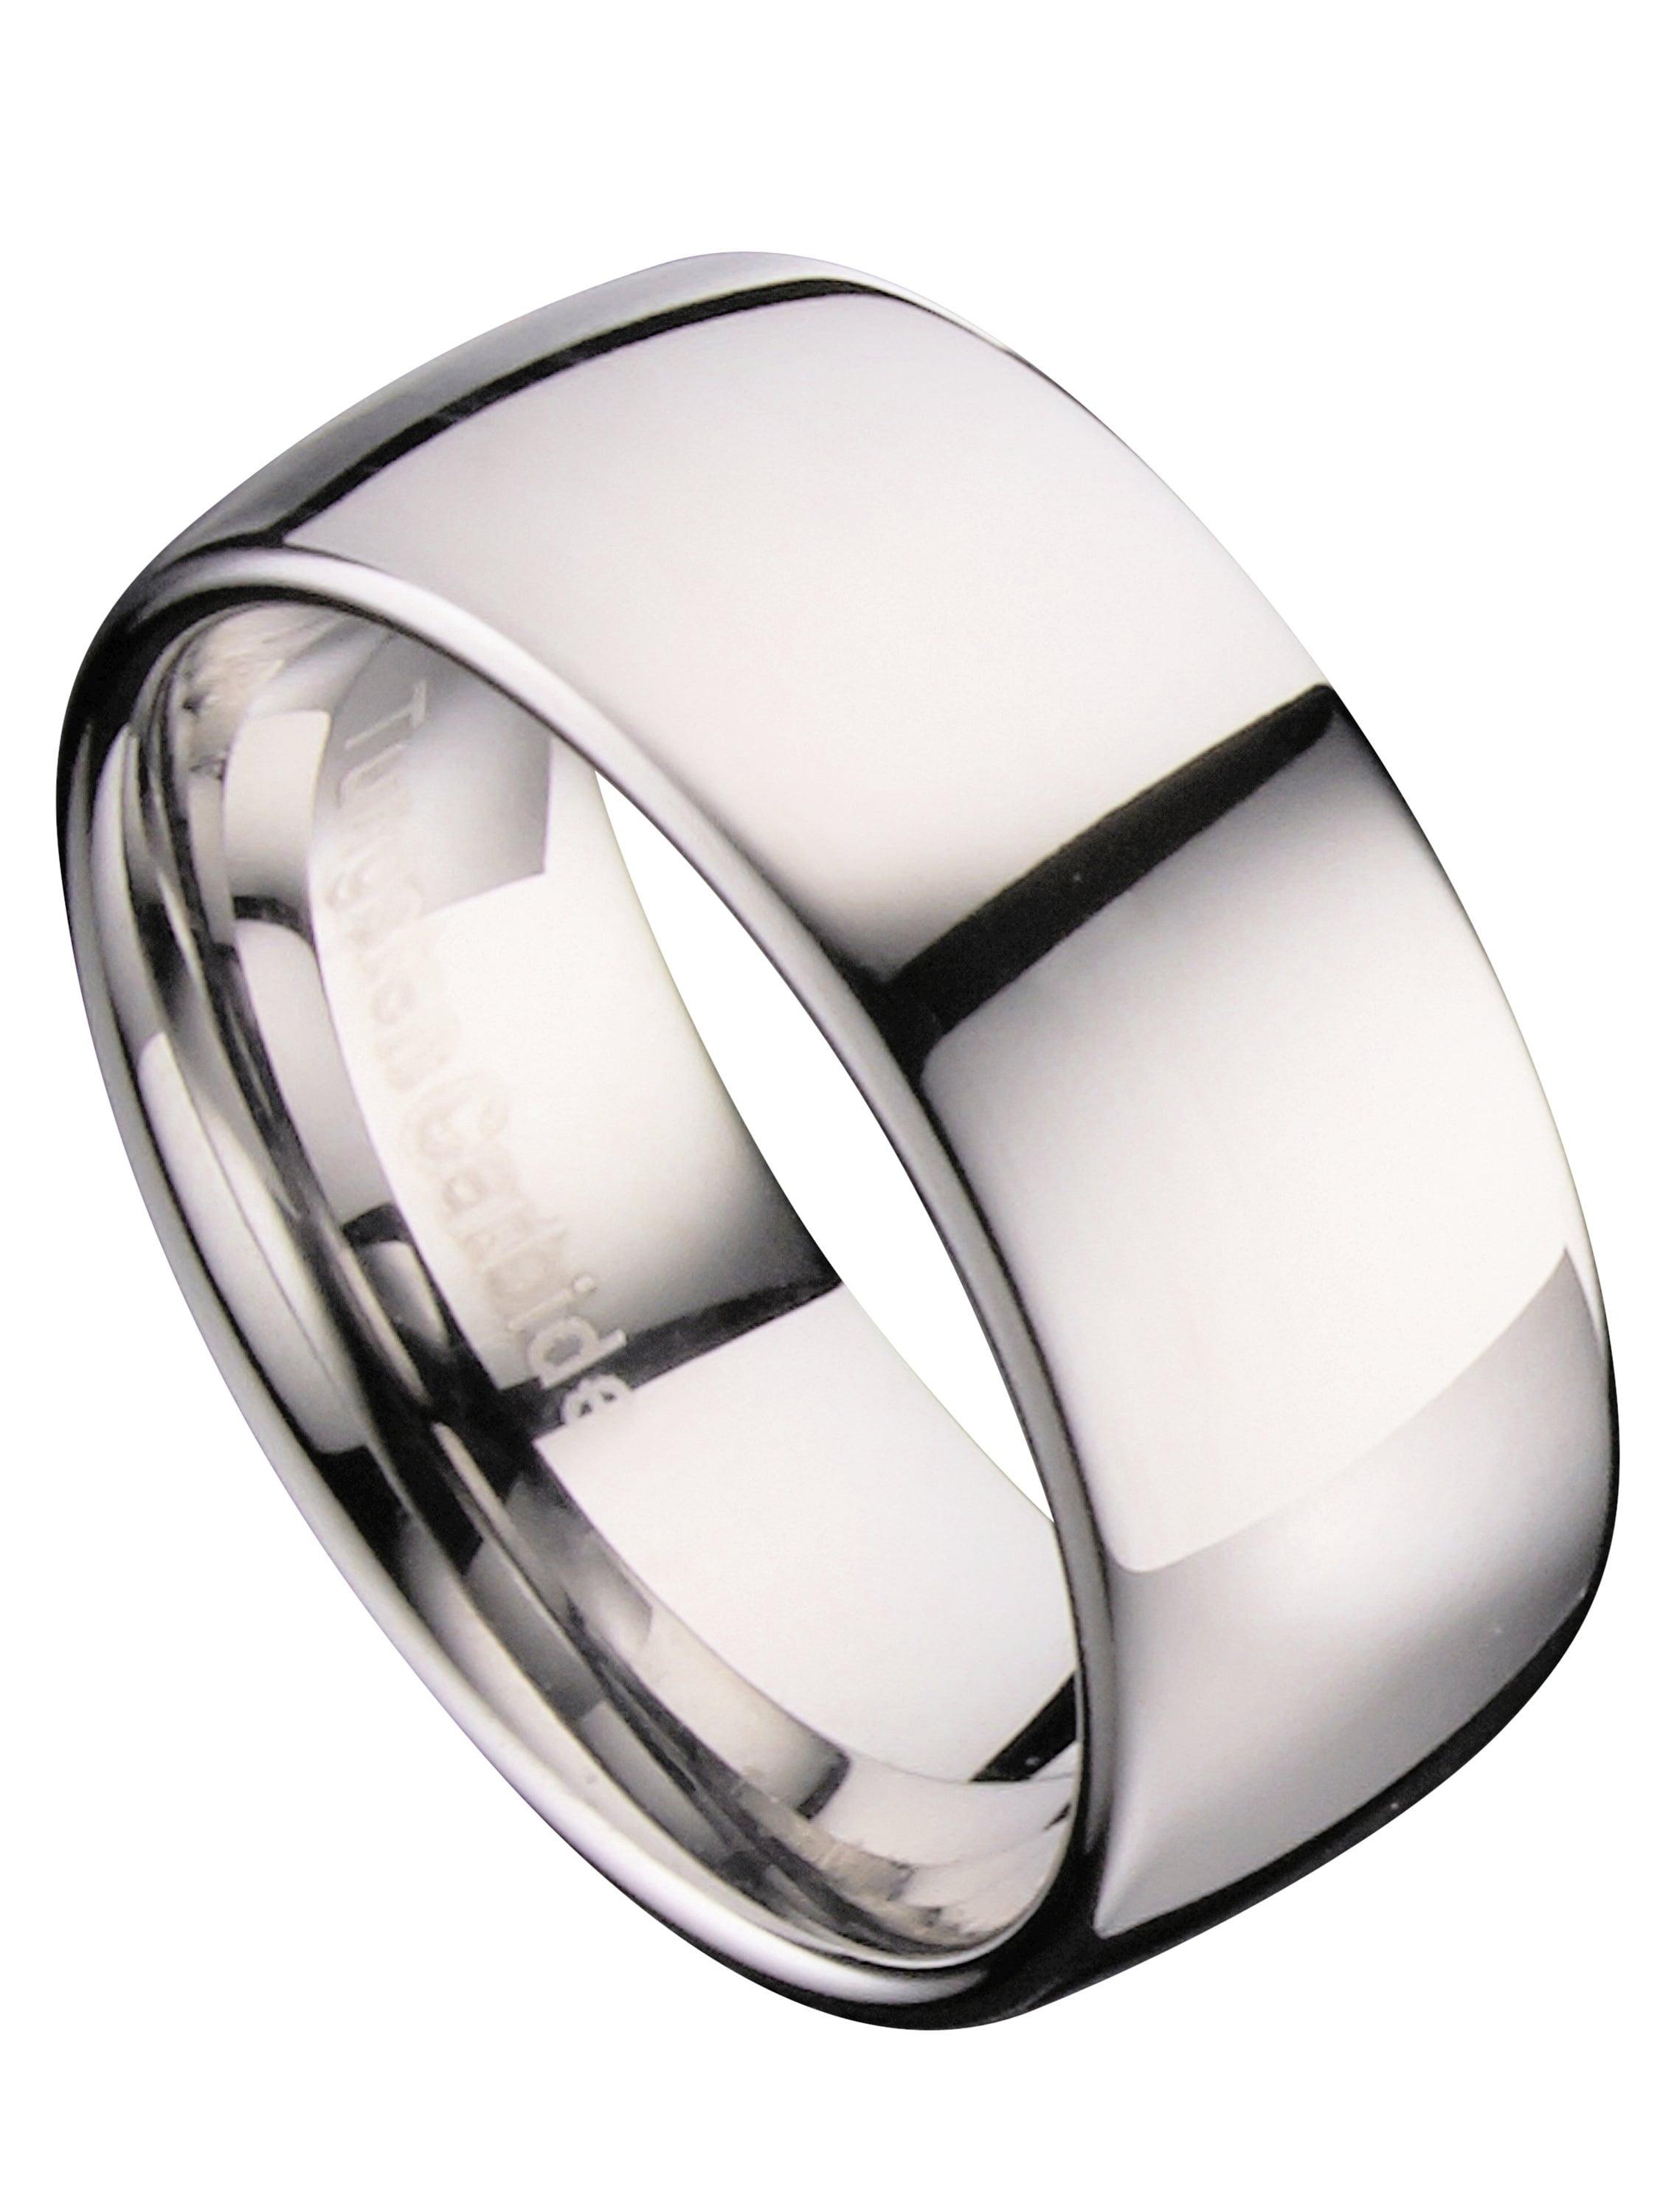 MJ Metals Jewelry - Tungsten Carbide Classic Wedding Ring ...